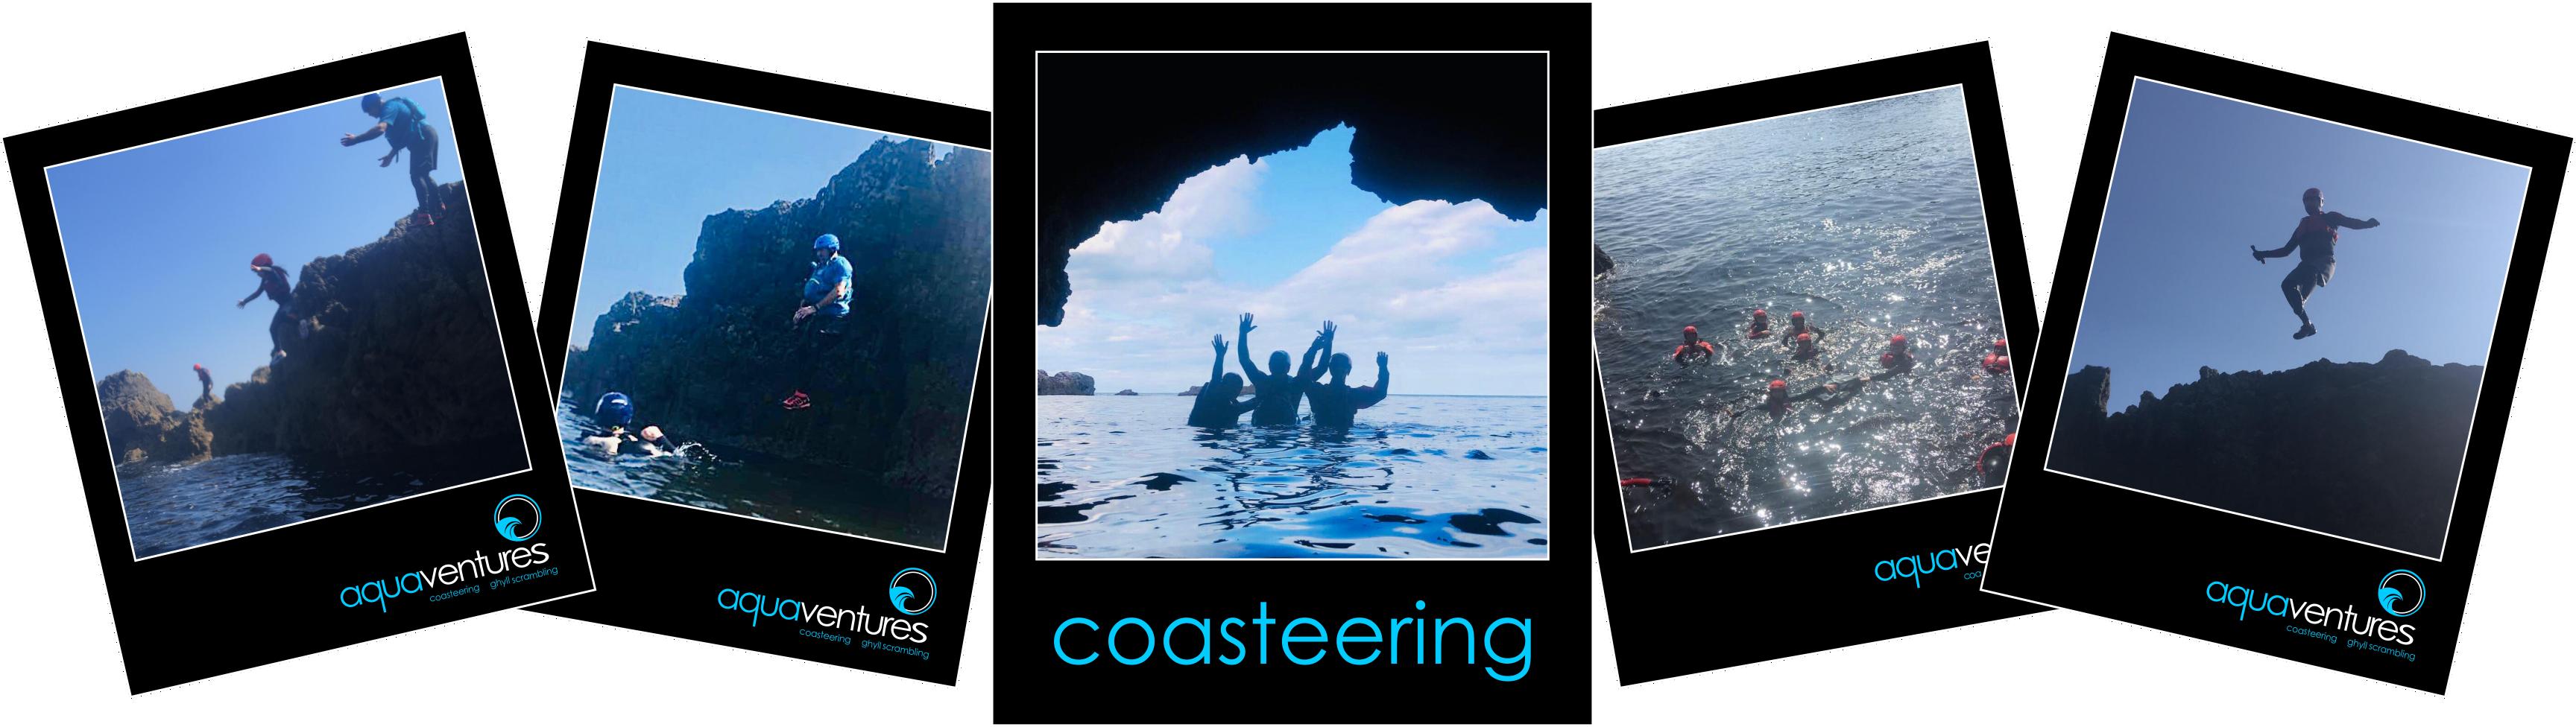 Coast 1.0